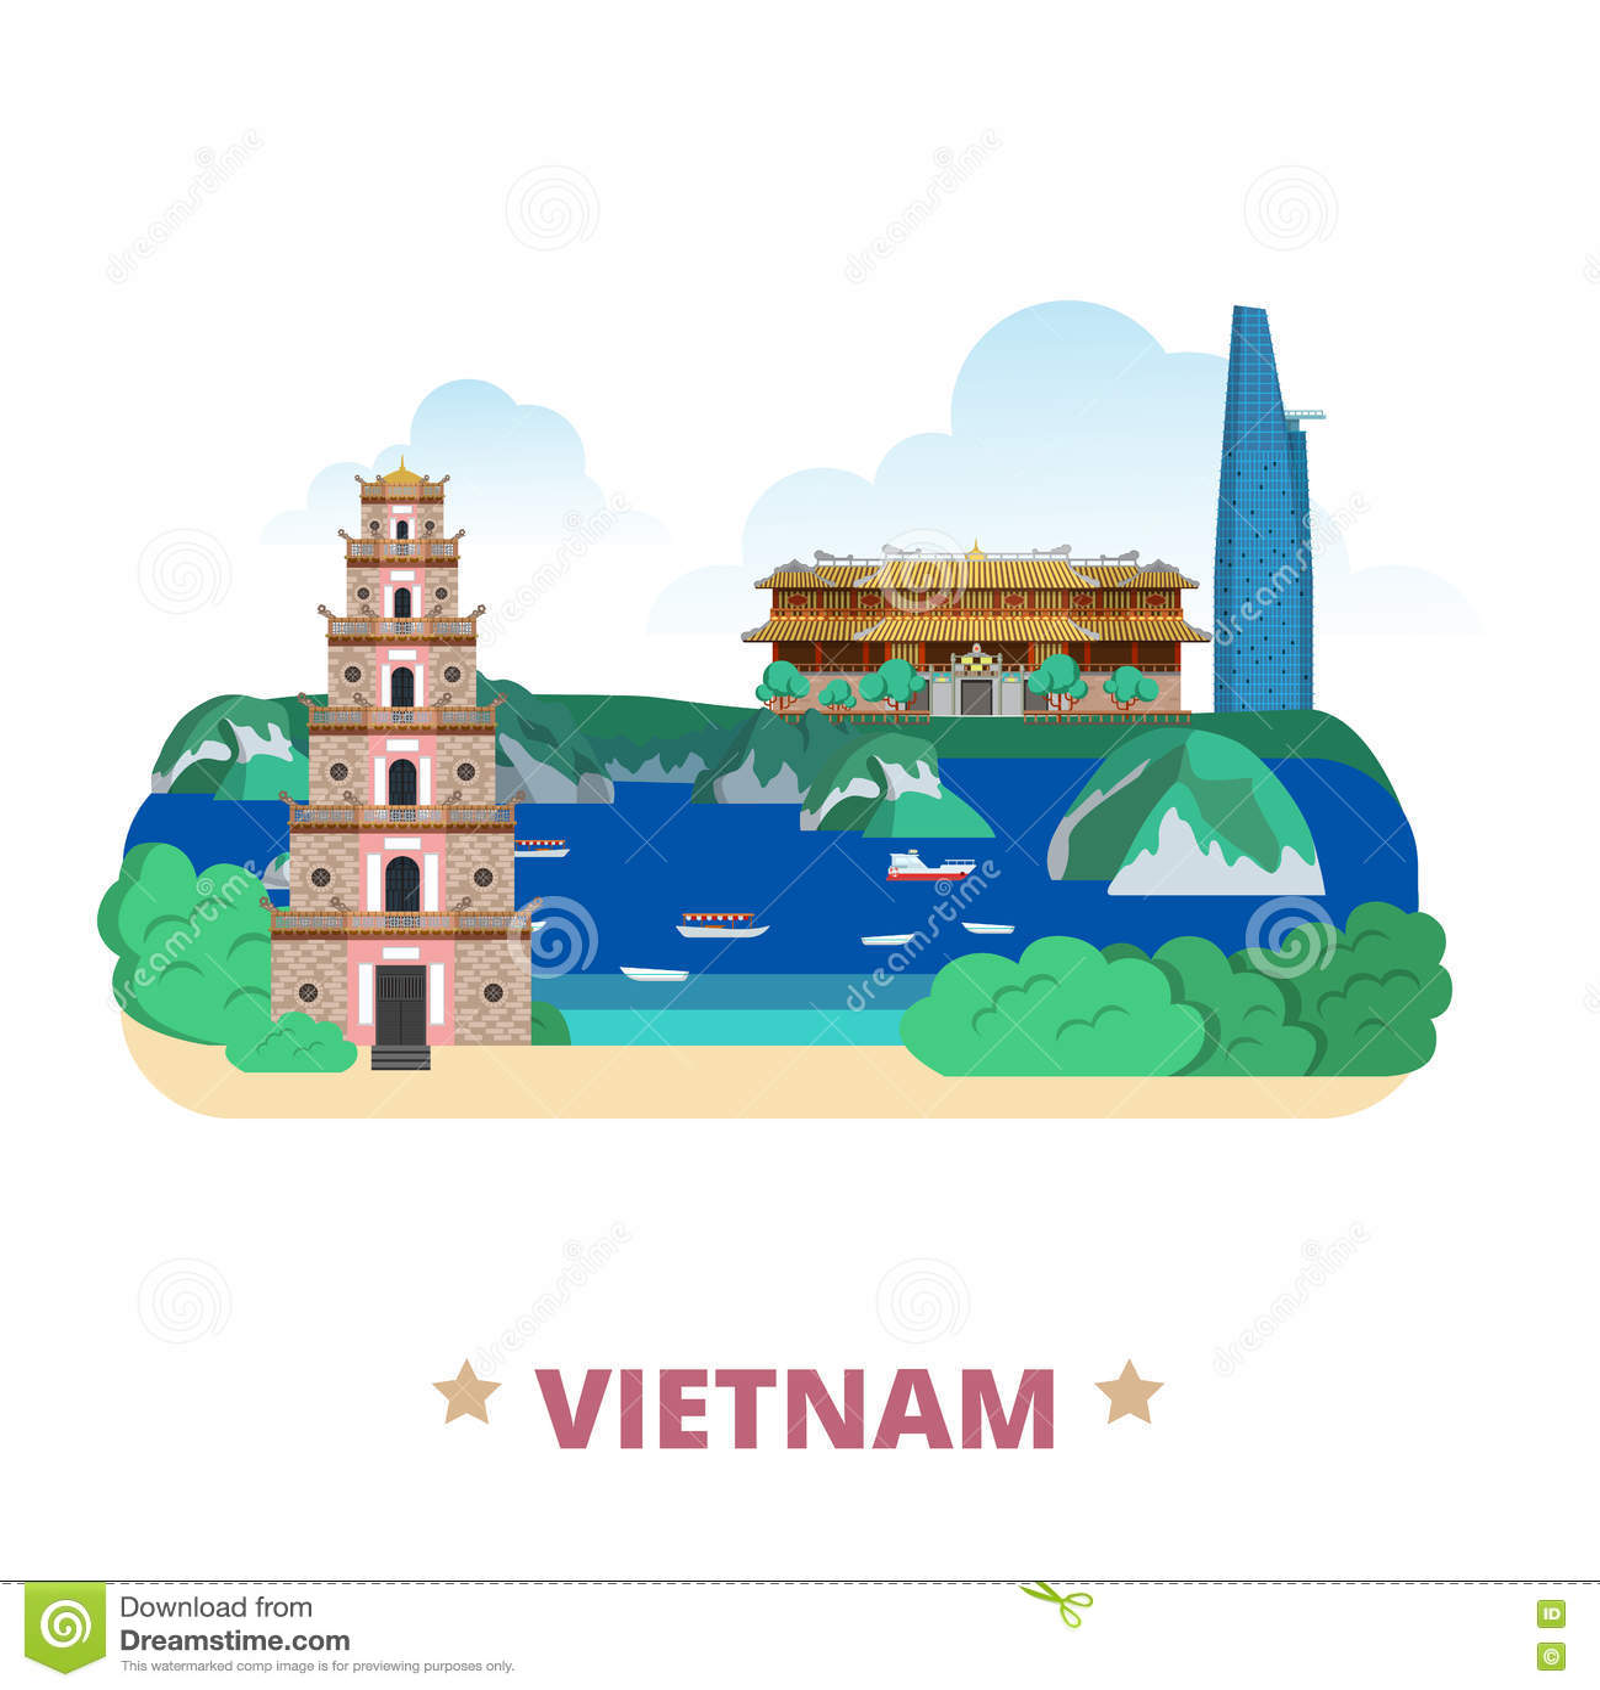 Vietnam country design template Flat cartoon style